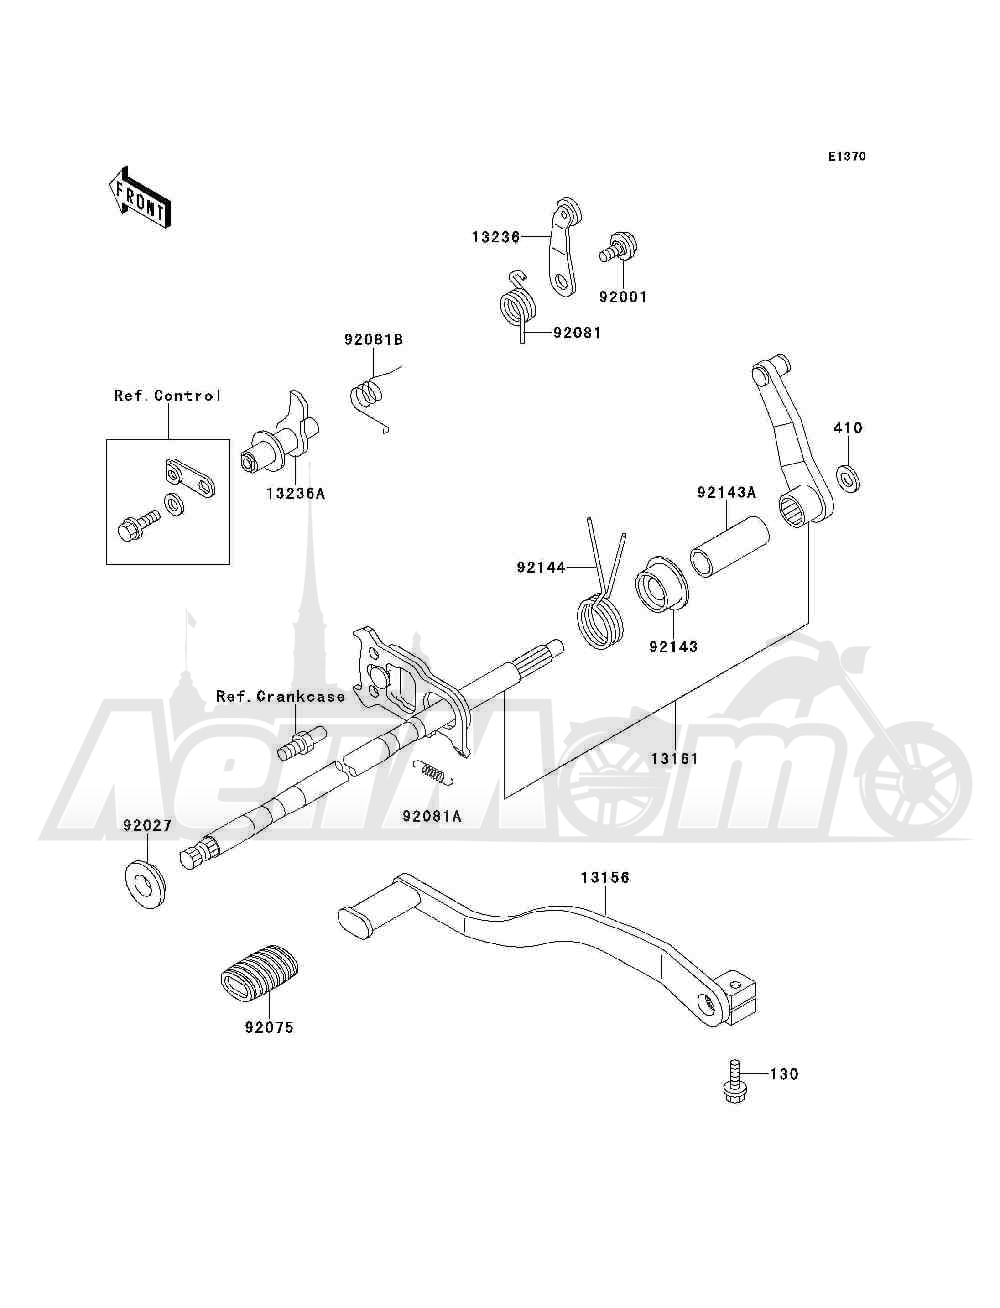 Запчасти для Квадроцикла Kawasaki 1994 BAYOU 300 4X4 (KLF300-C6) Раздел: GEAR CHANGE MECHANISM | переключение передач механизм